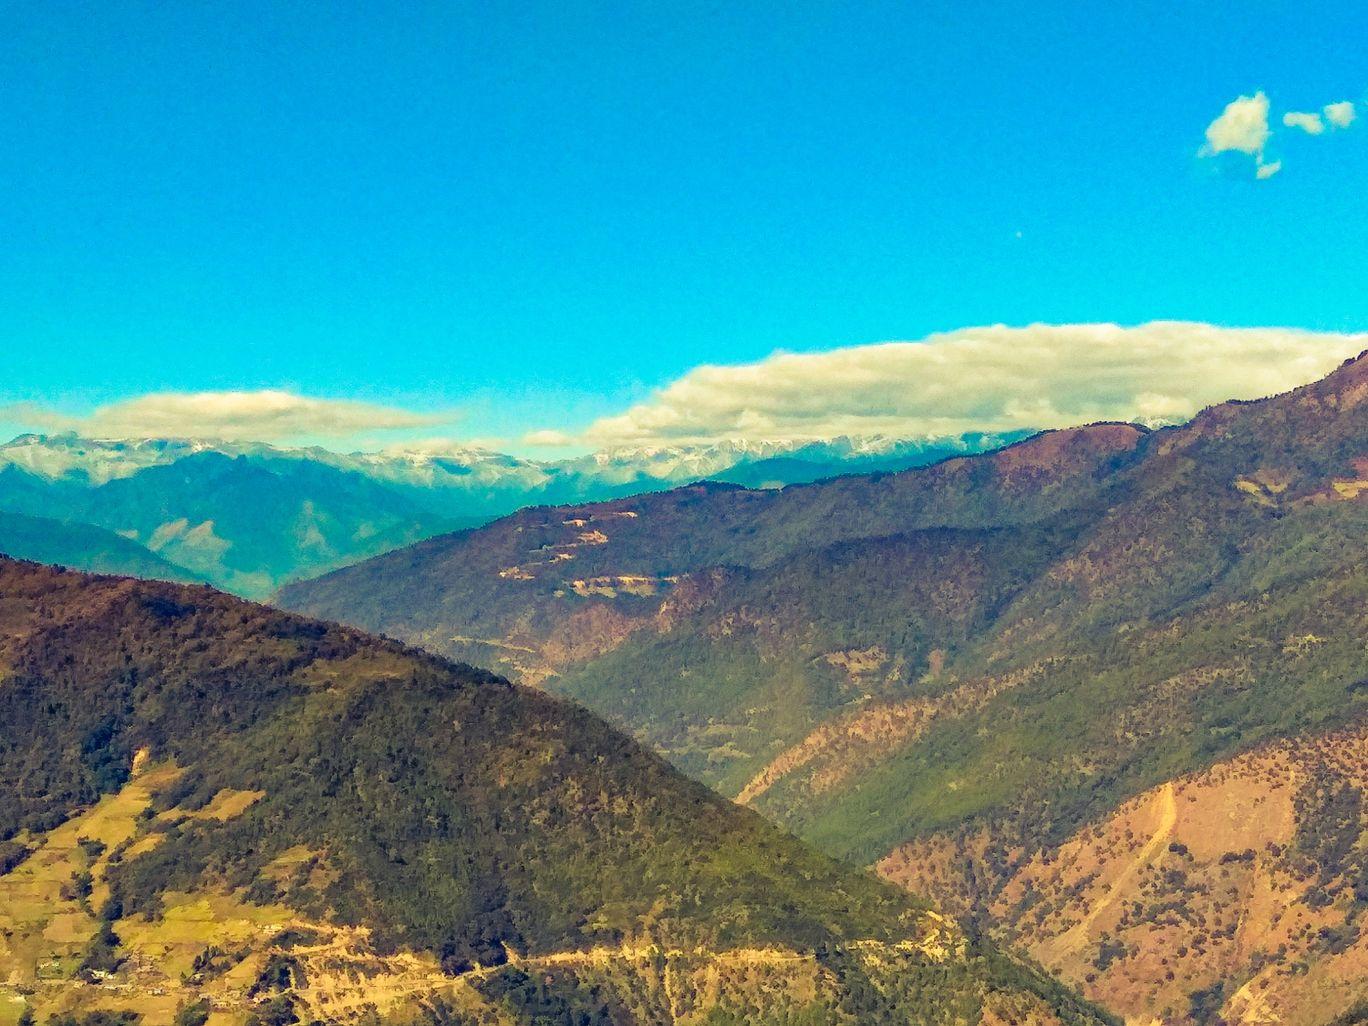 Photo of Arunachal Pradesh By BhagyasriQuirky Tuber SingerTrAvel